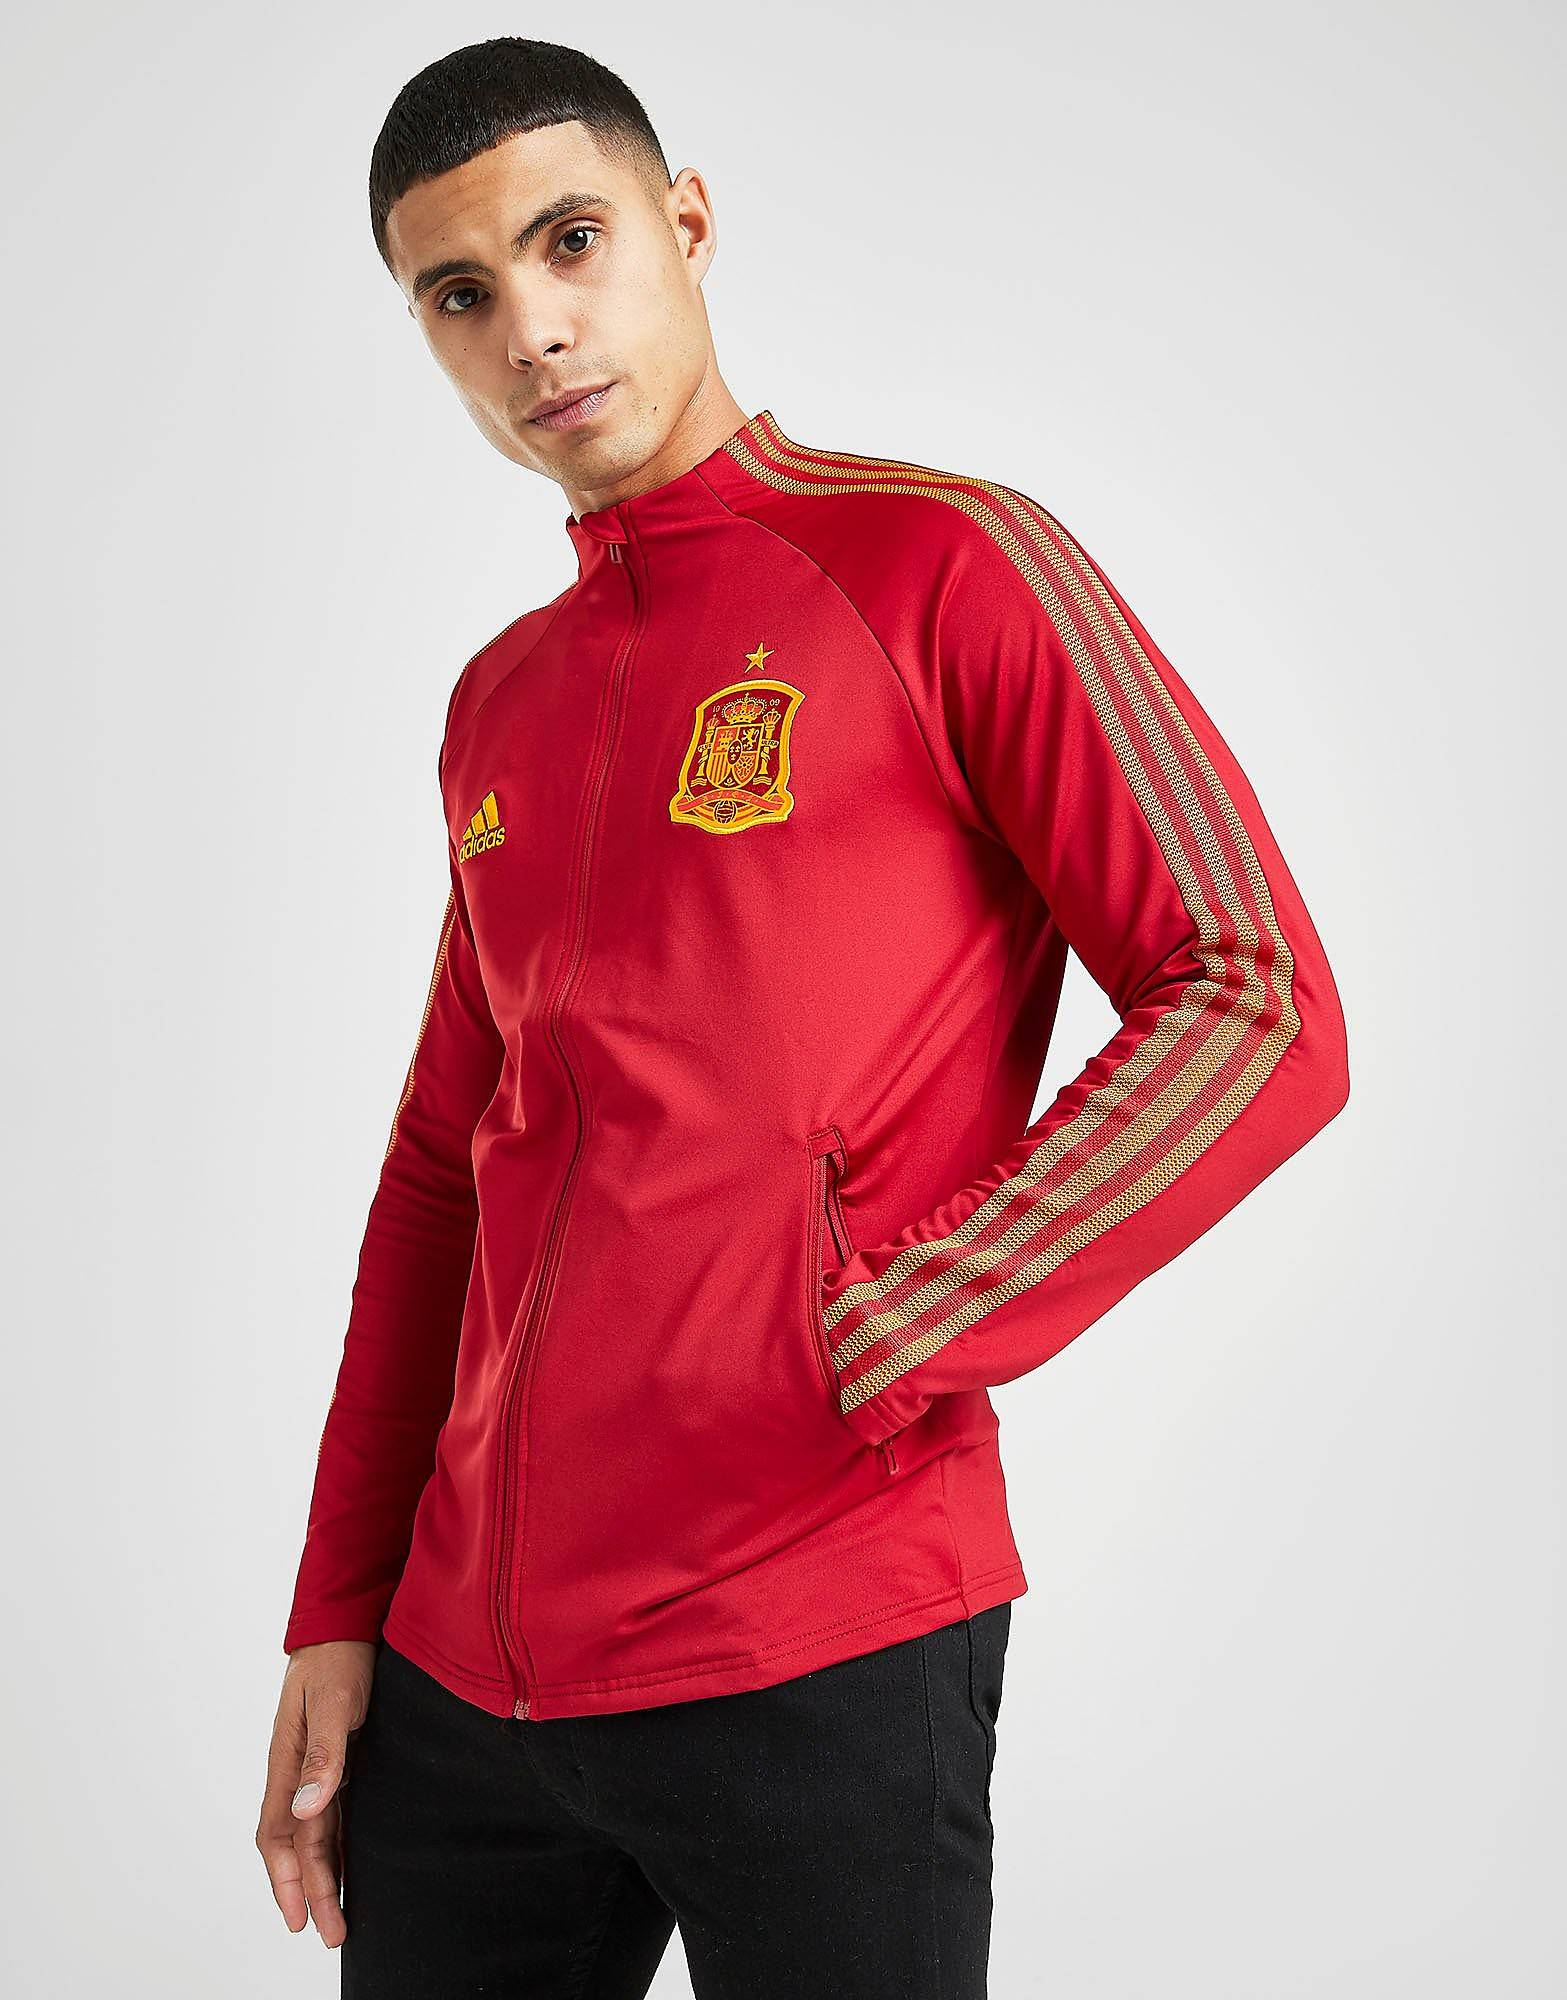 Image of Adidas Spain Anthem Takki Miehet - Mens, Punainen